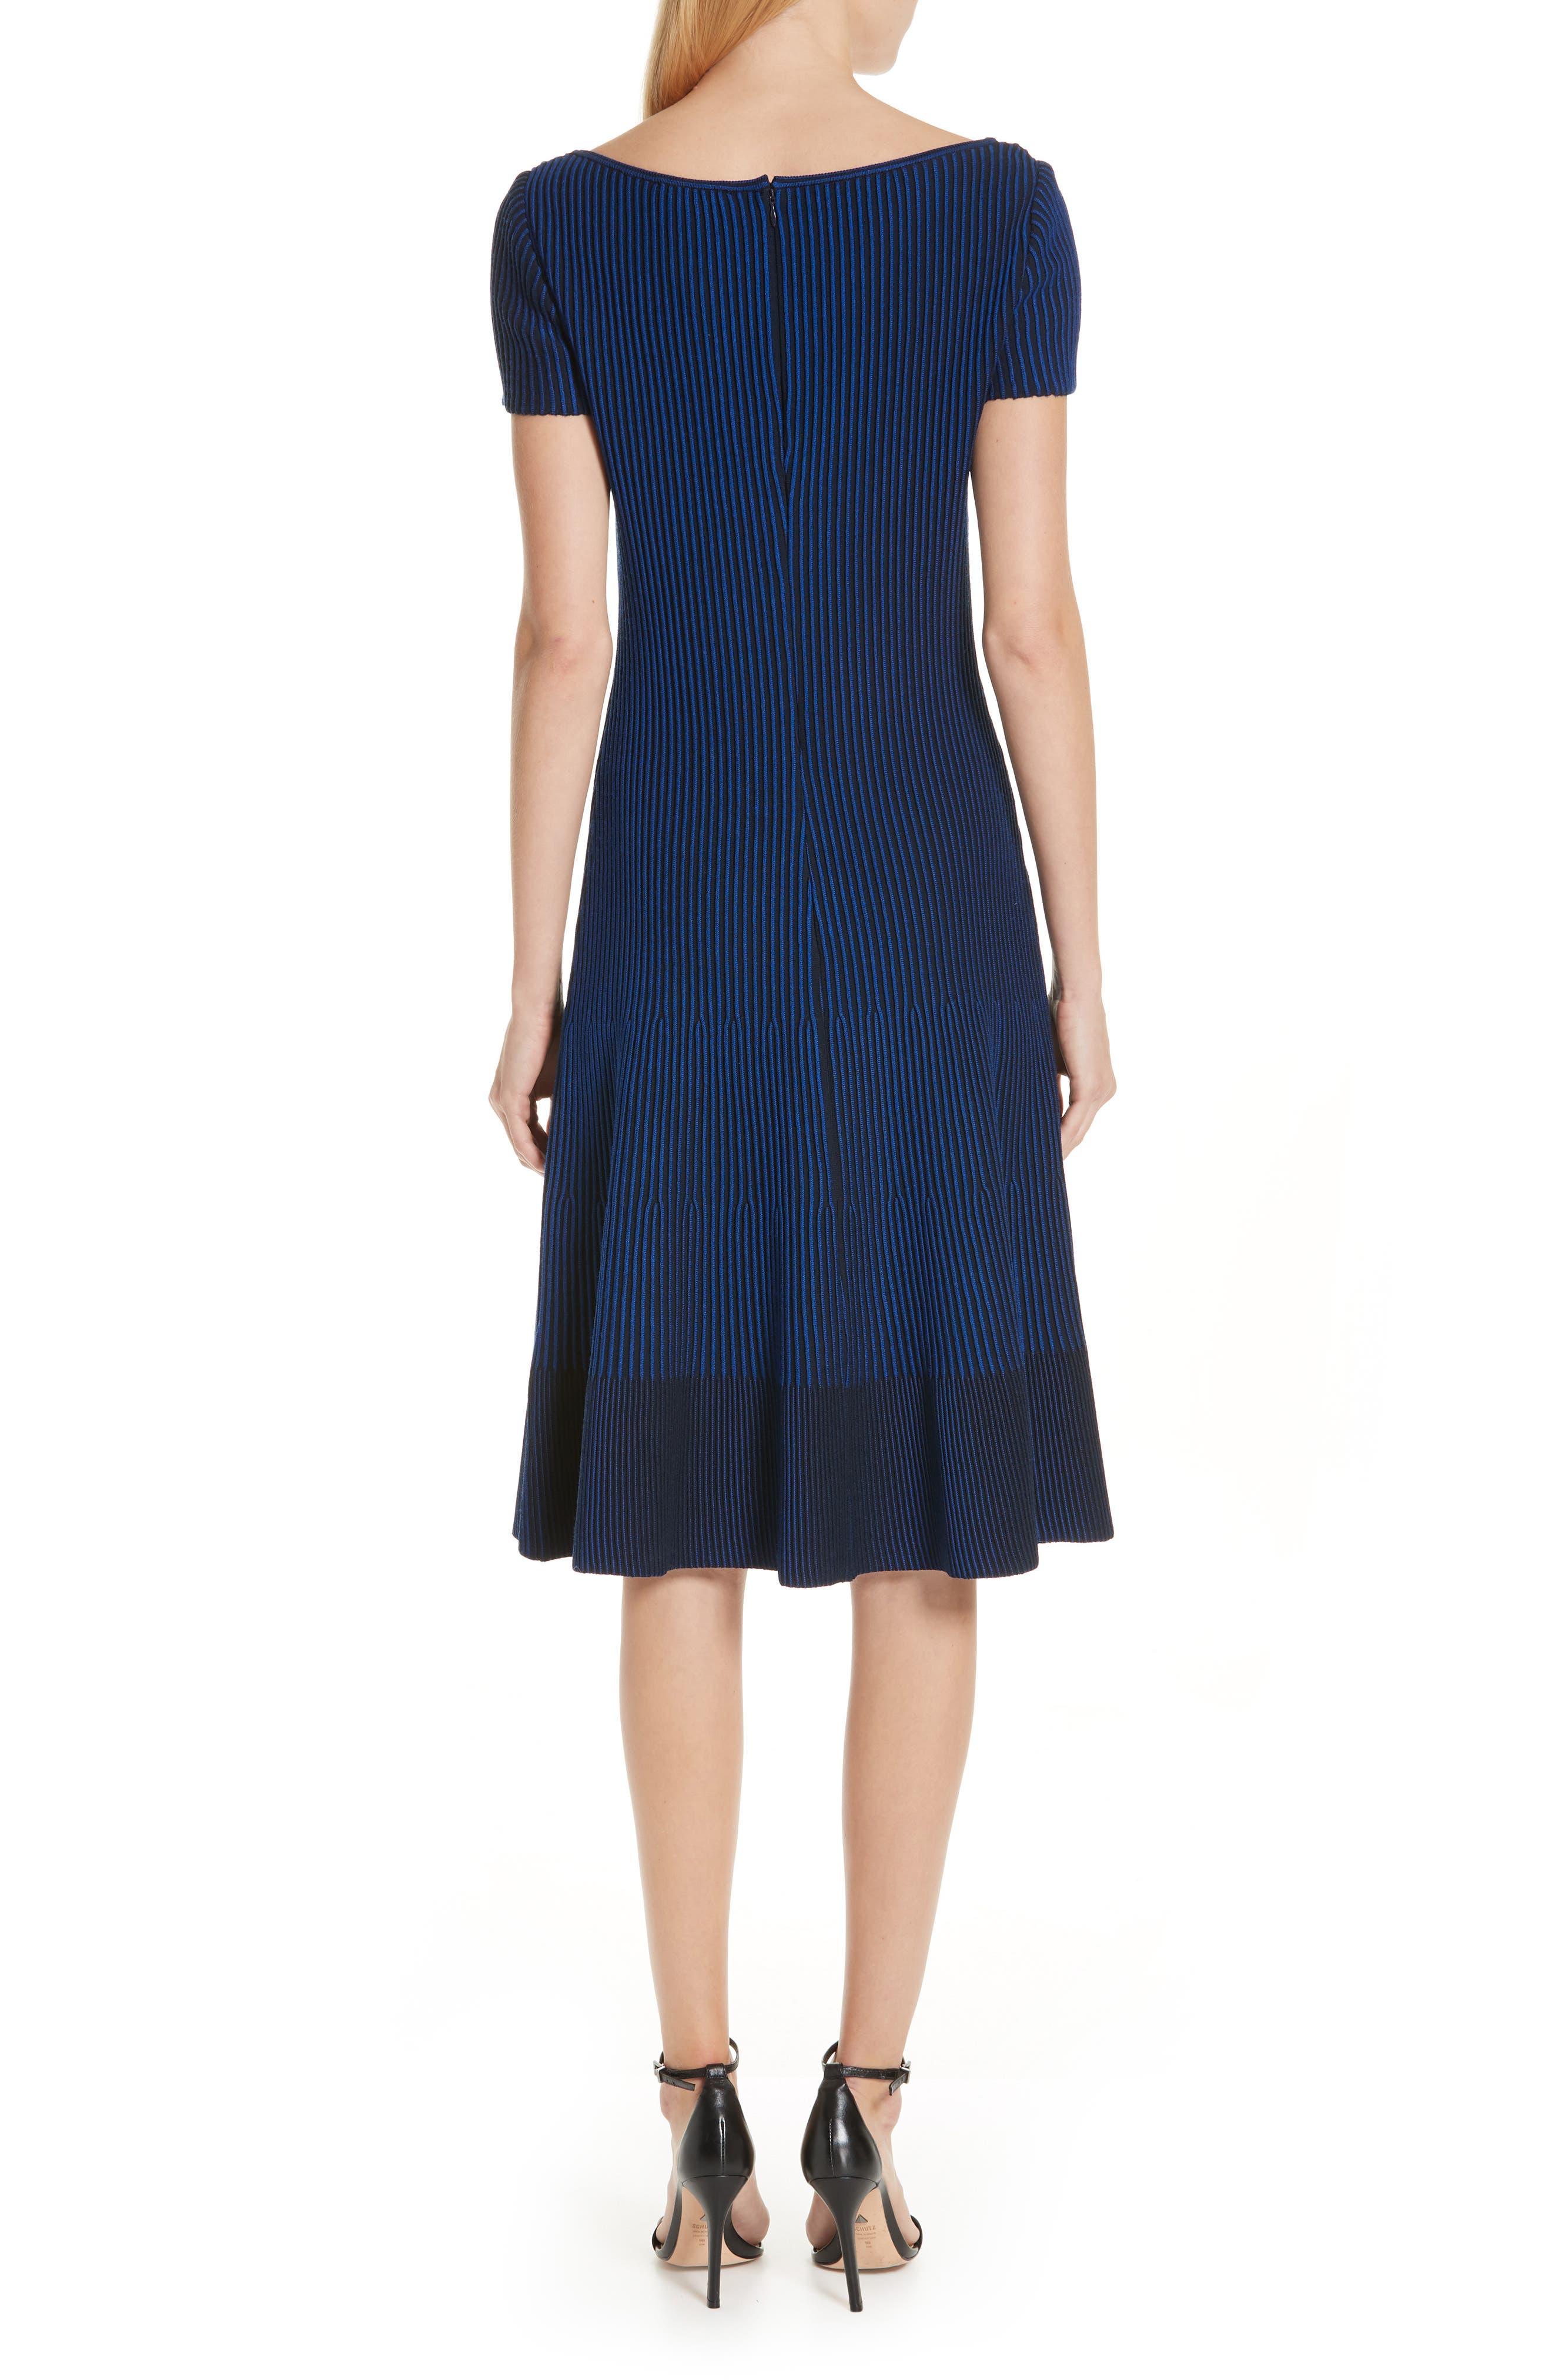 ST. JOHN COLLECTION, Ottoman Fit & Flare Sweater Dress, Alternate thumbnail 2, color, AZUL/ NAVY MULTI